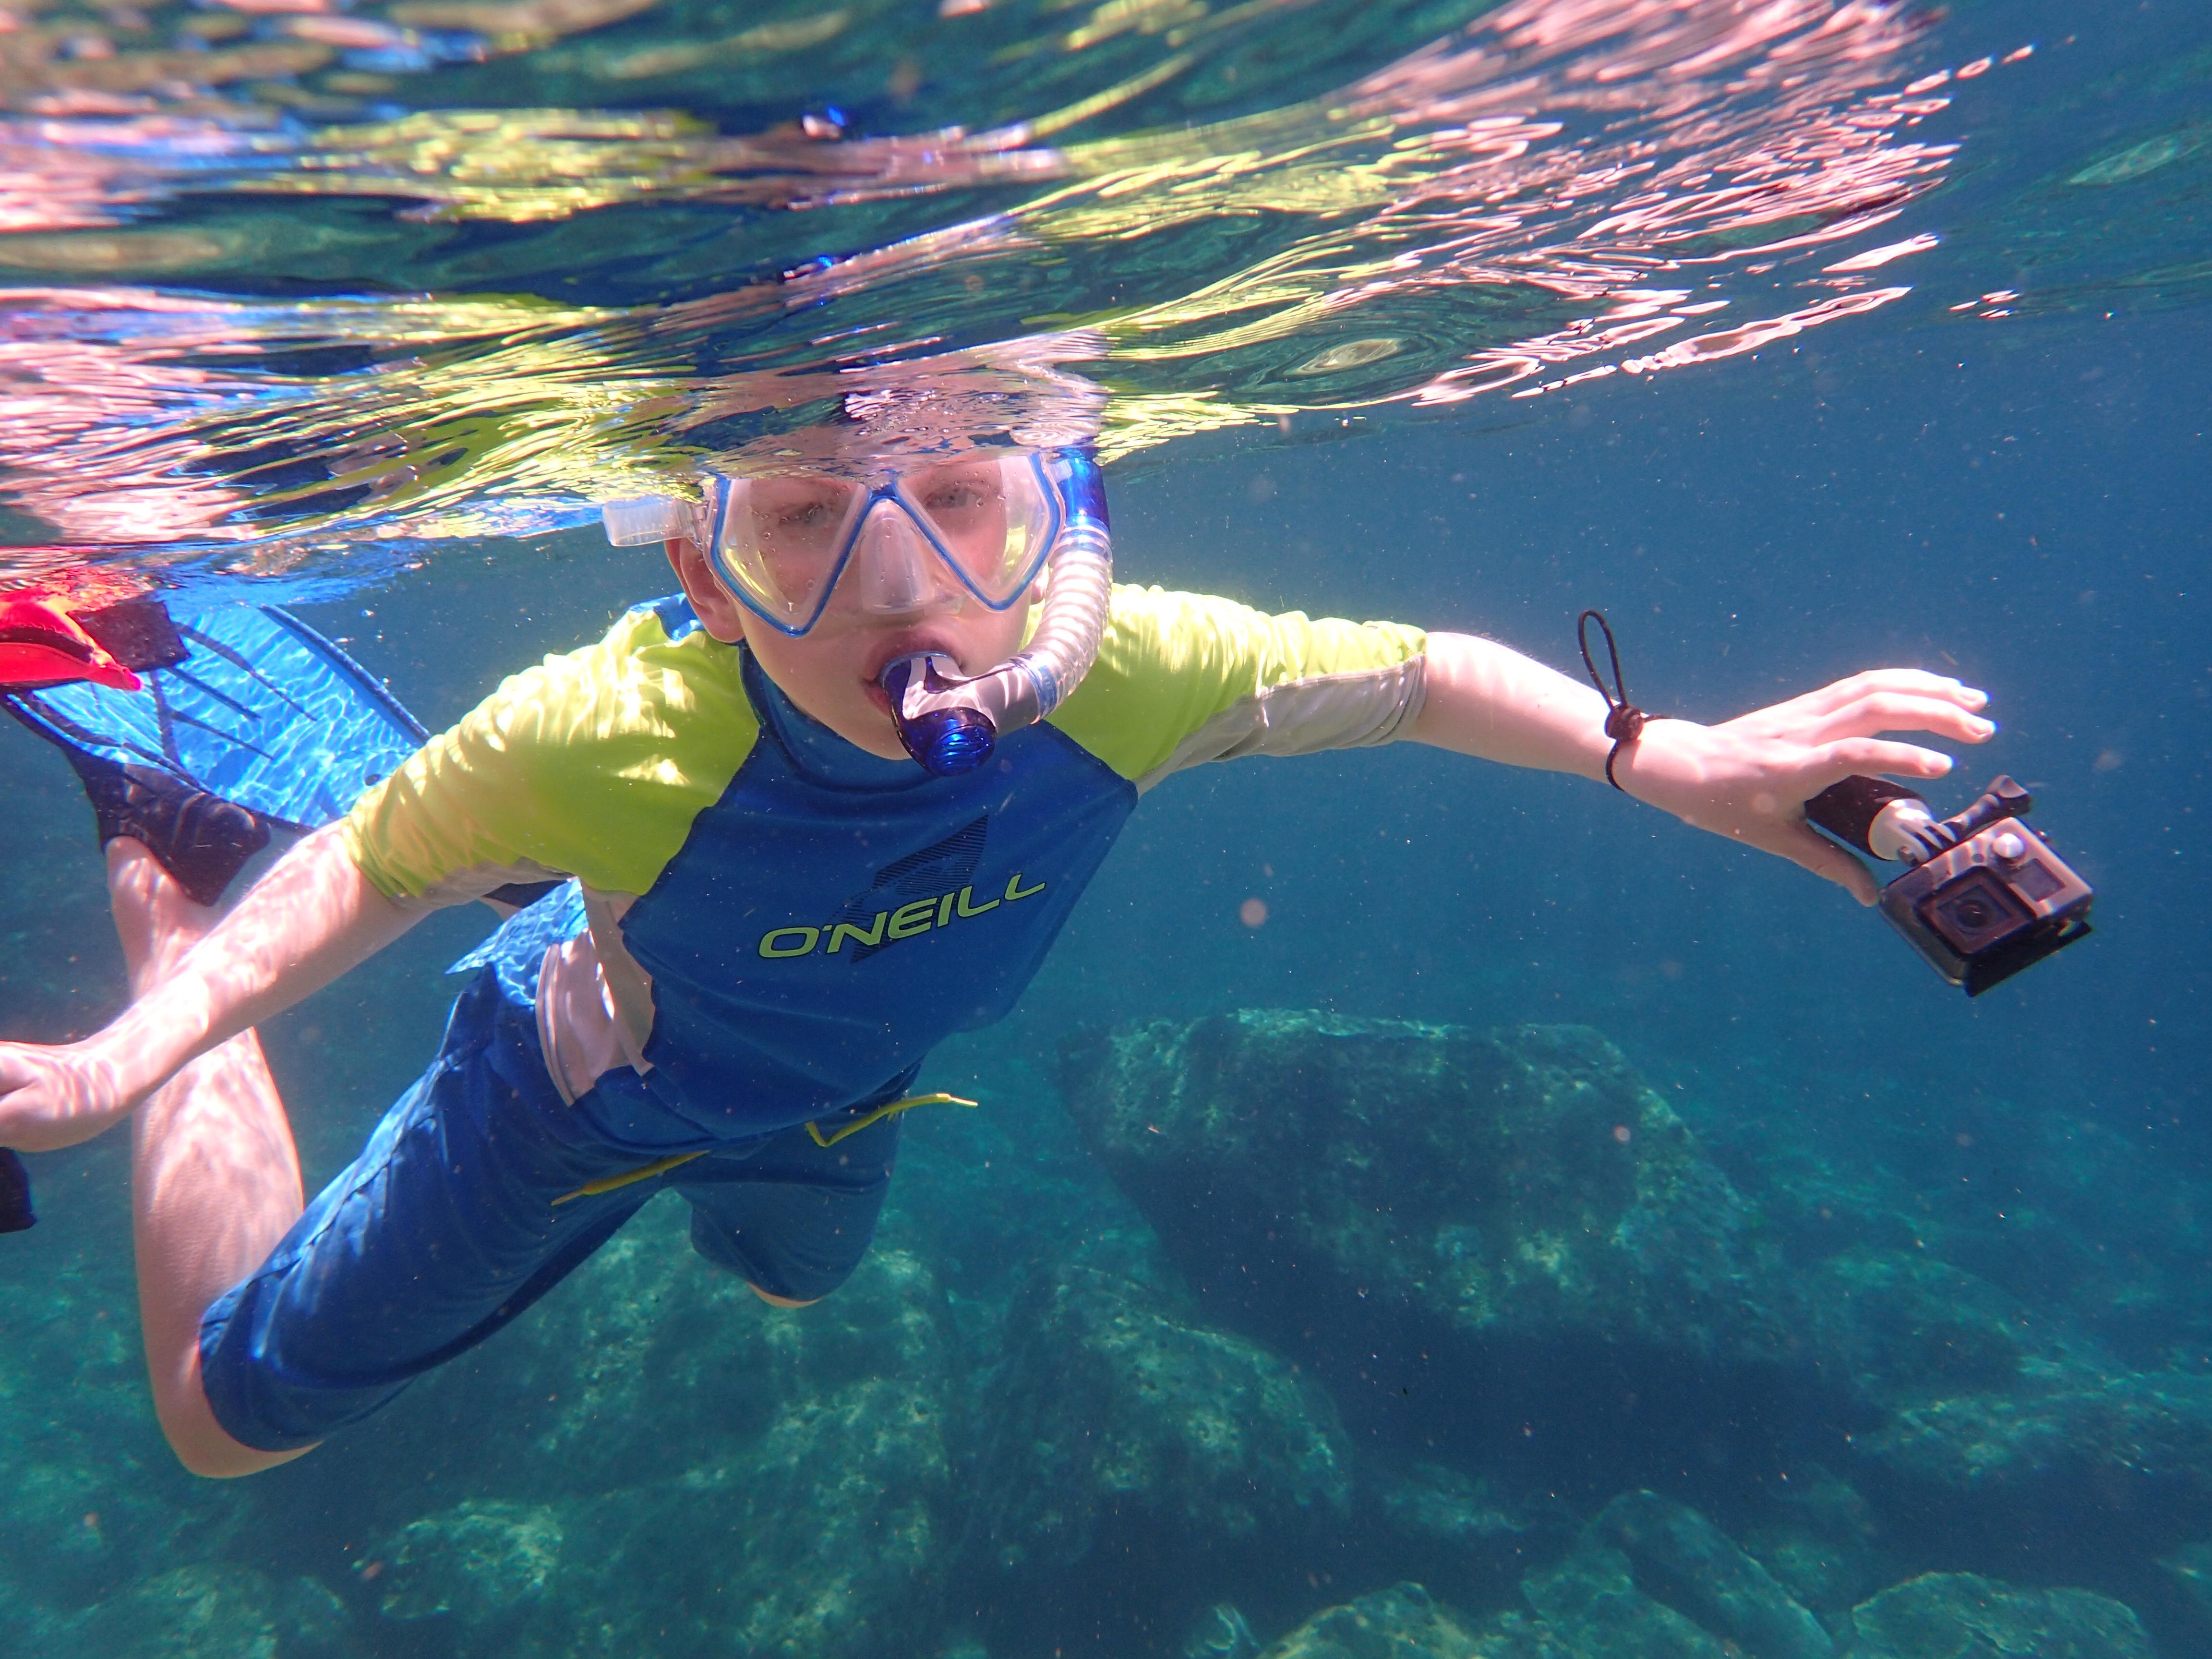 Enjoy snorkeling on virtually any beach